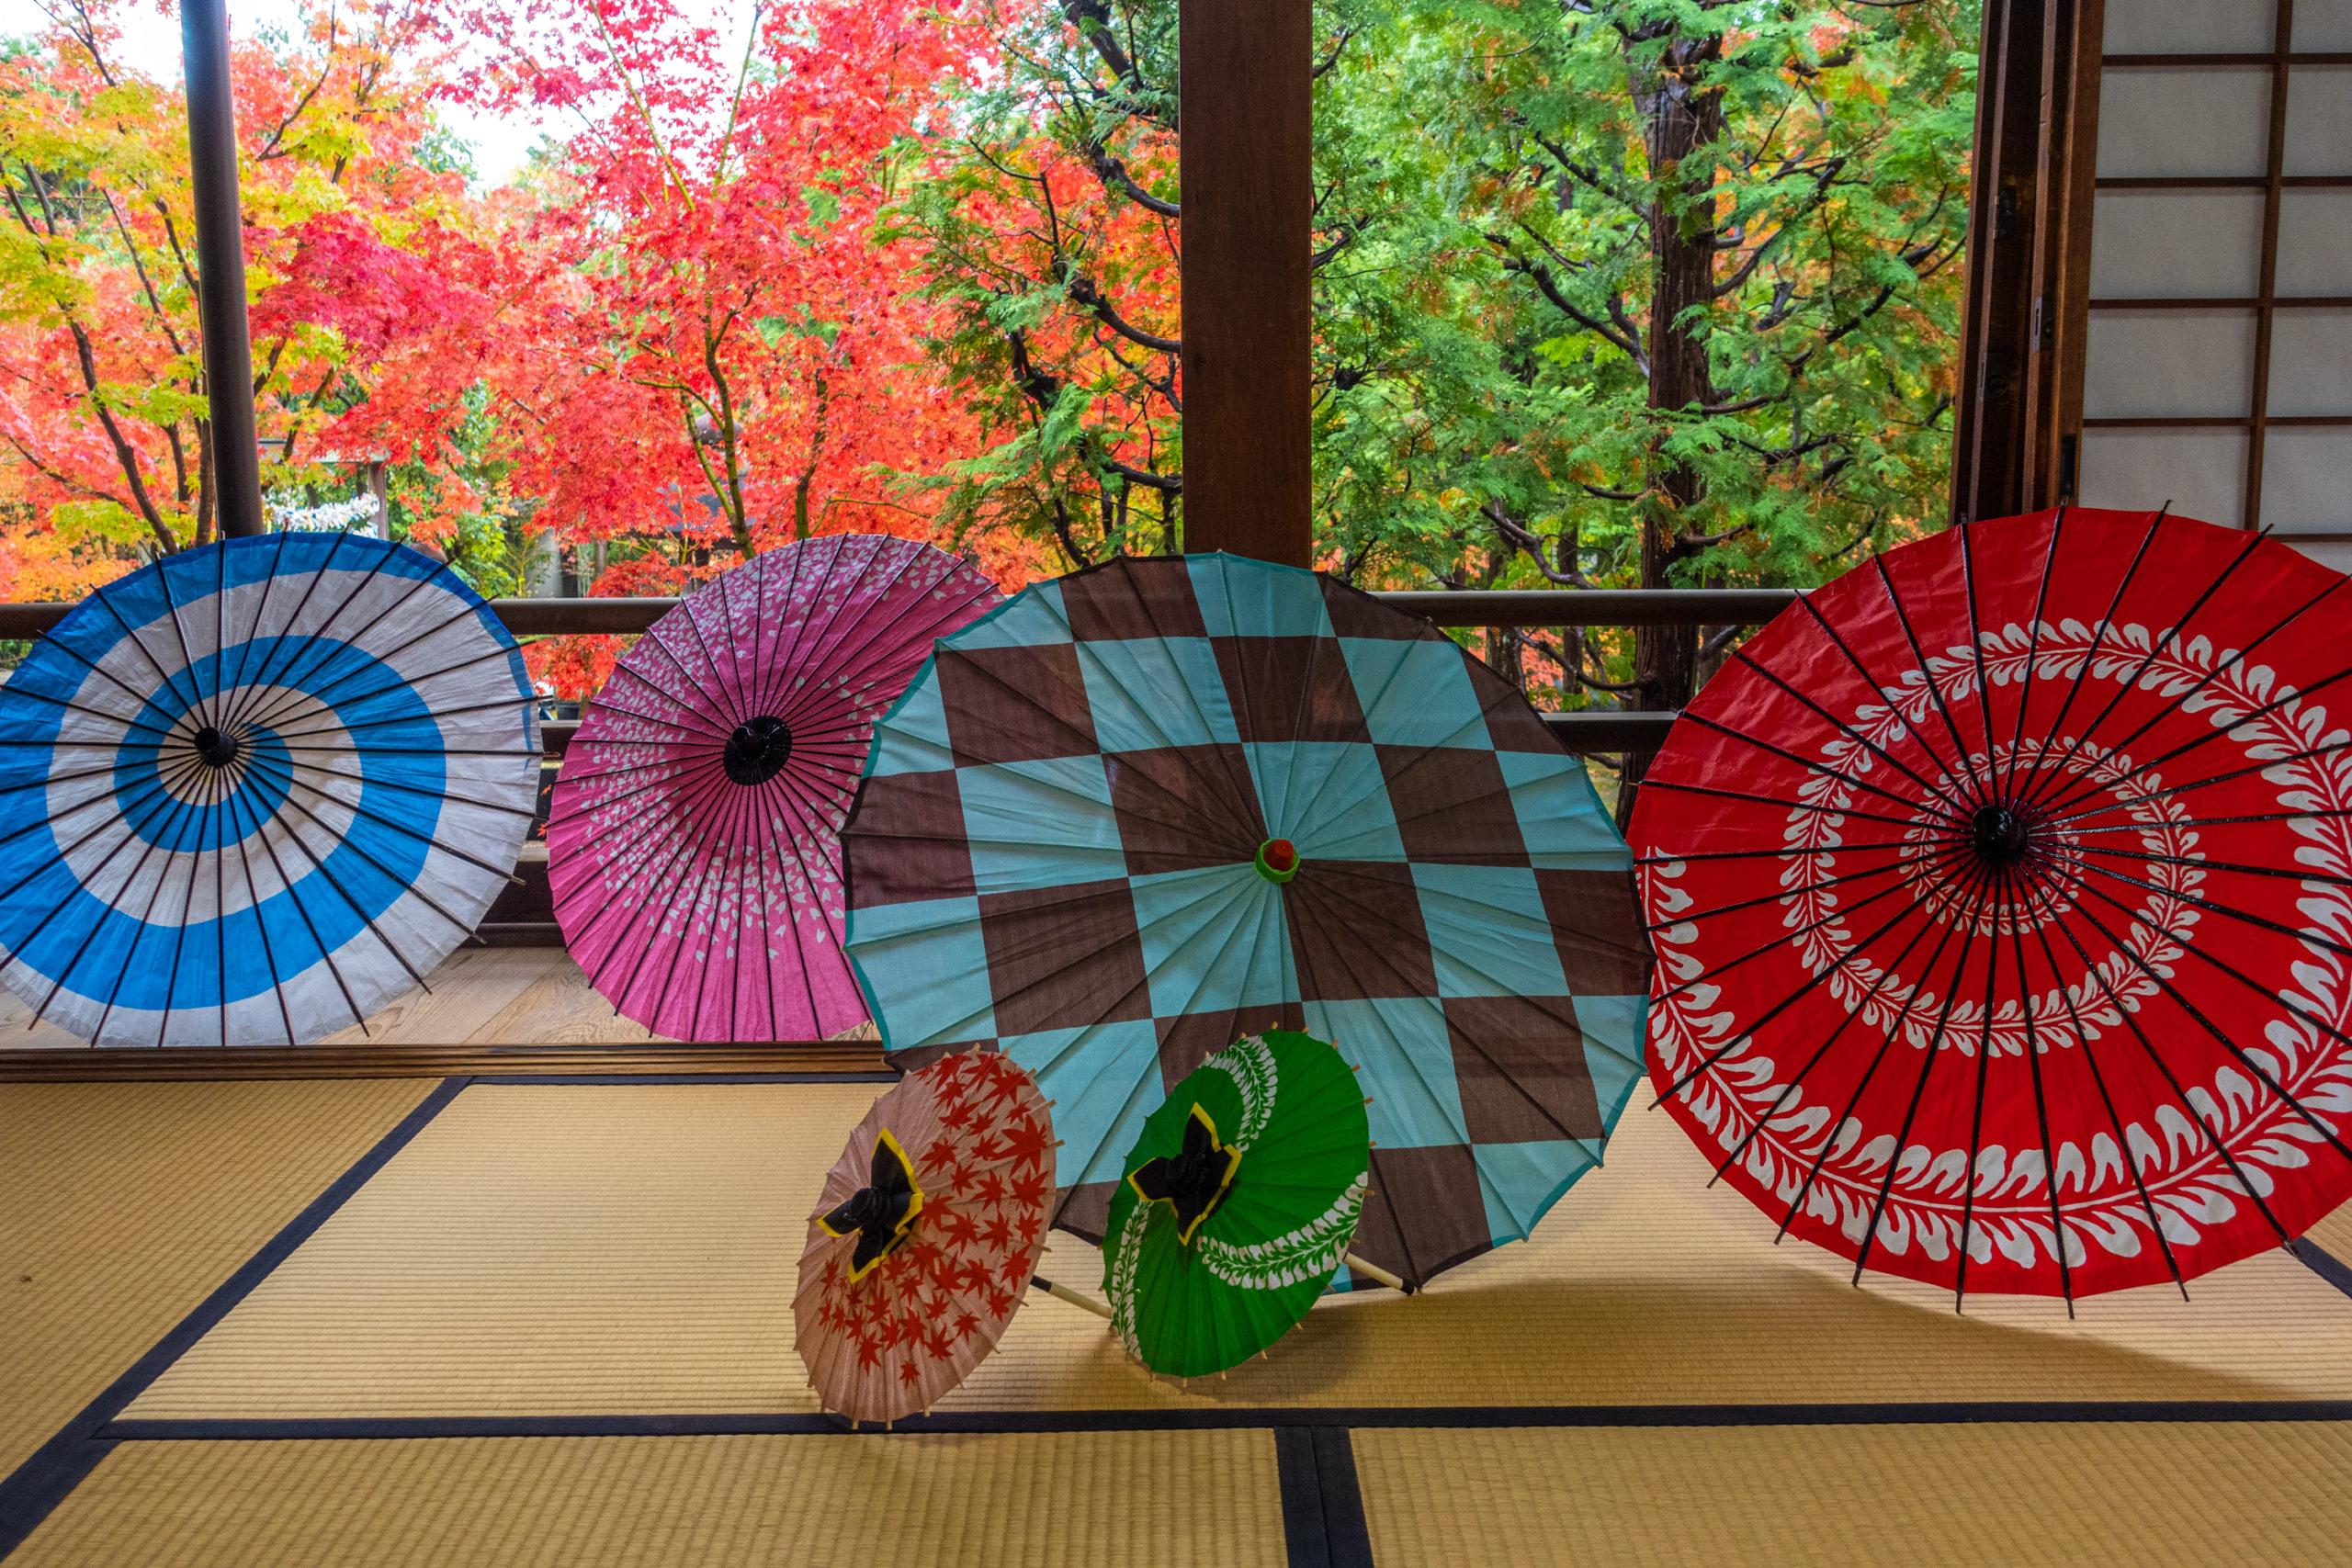 DSC00913-scaled 京都  勝林寺(紅葉と和傘の風情を感じる景色が美しい秋におすすめのスポット!撮影した写真の紹介、アクセス情報など)